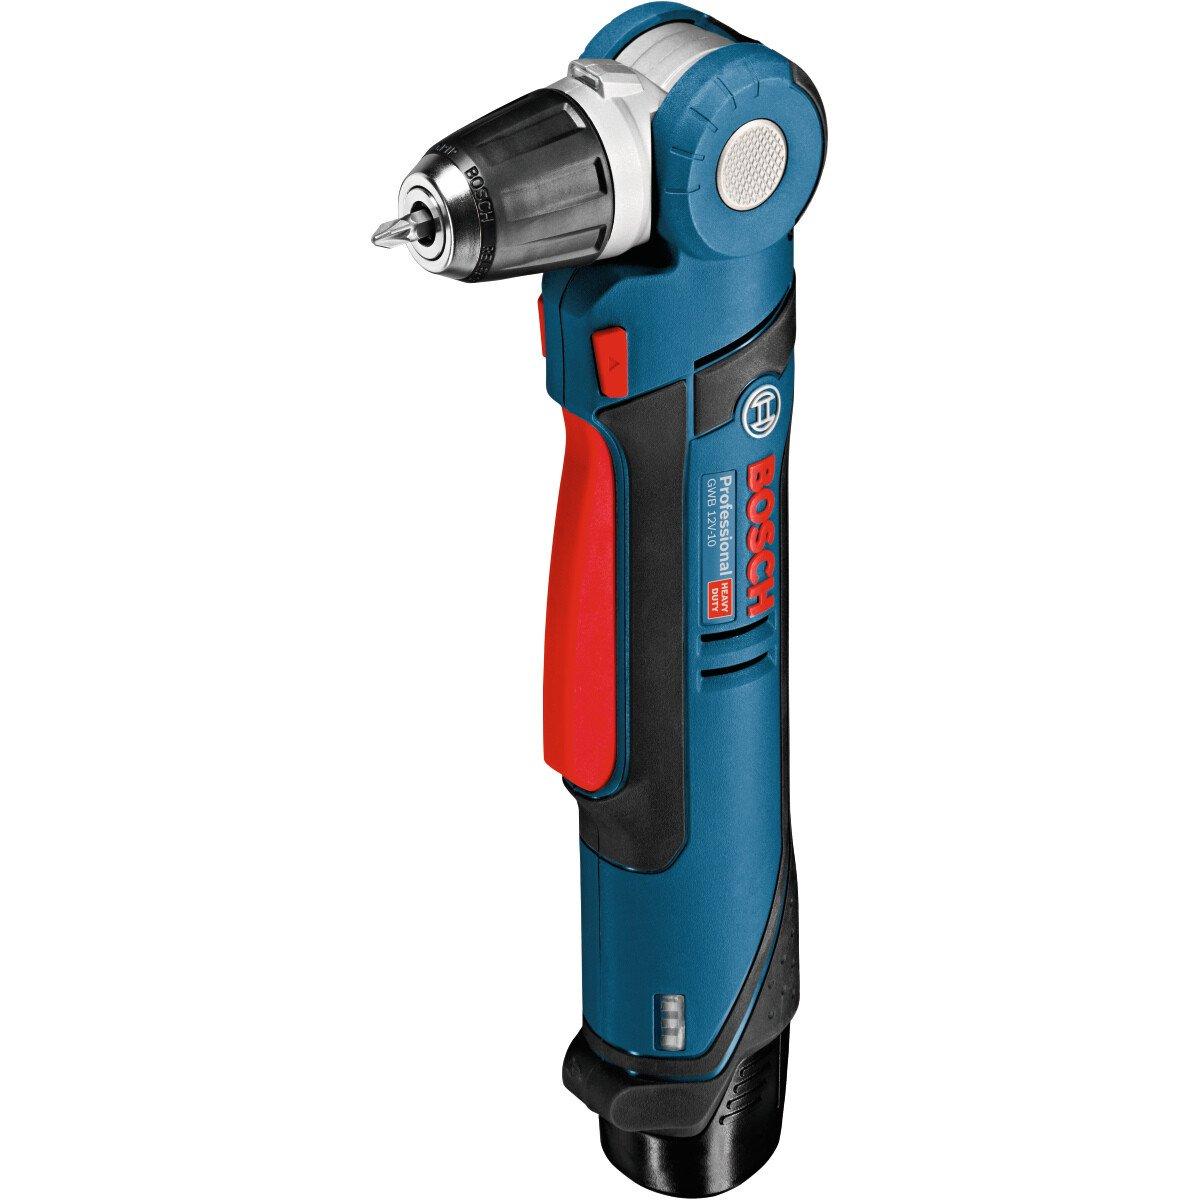 Bosch GWB12V-10 12V Cordless Angle Drill/Driver (2x2.0Ah Li-ion)